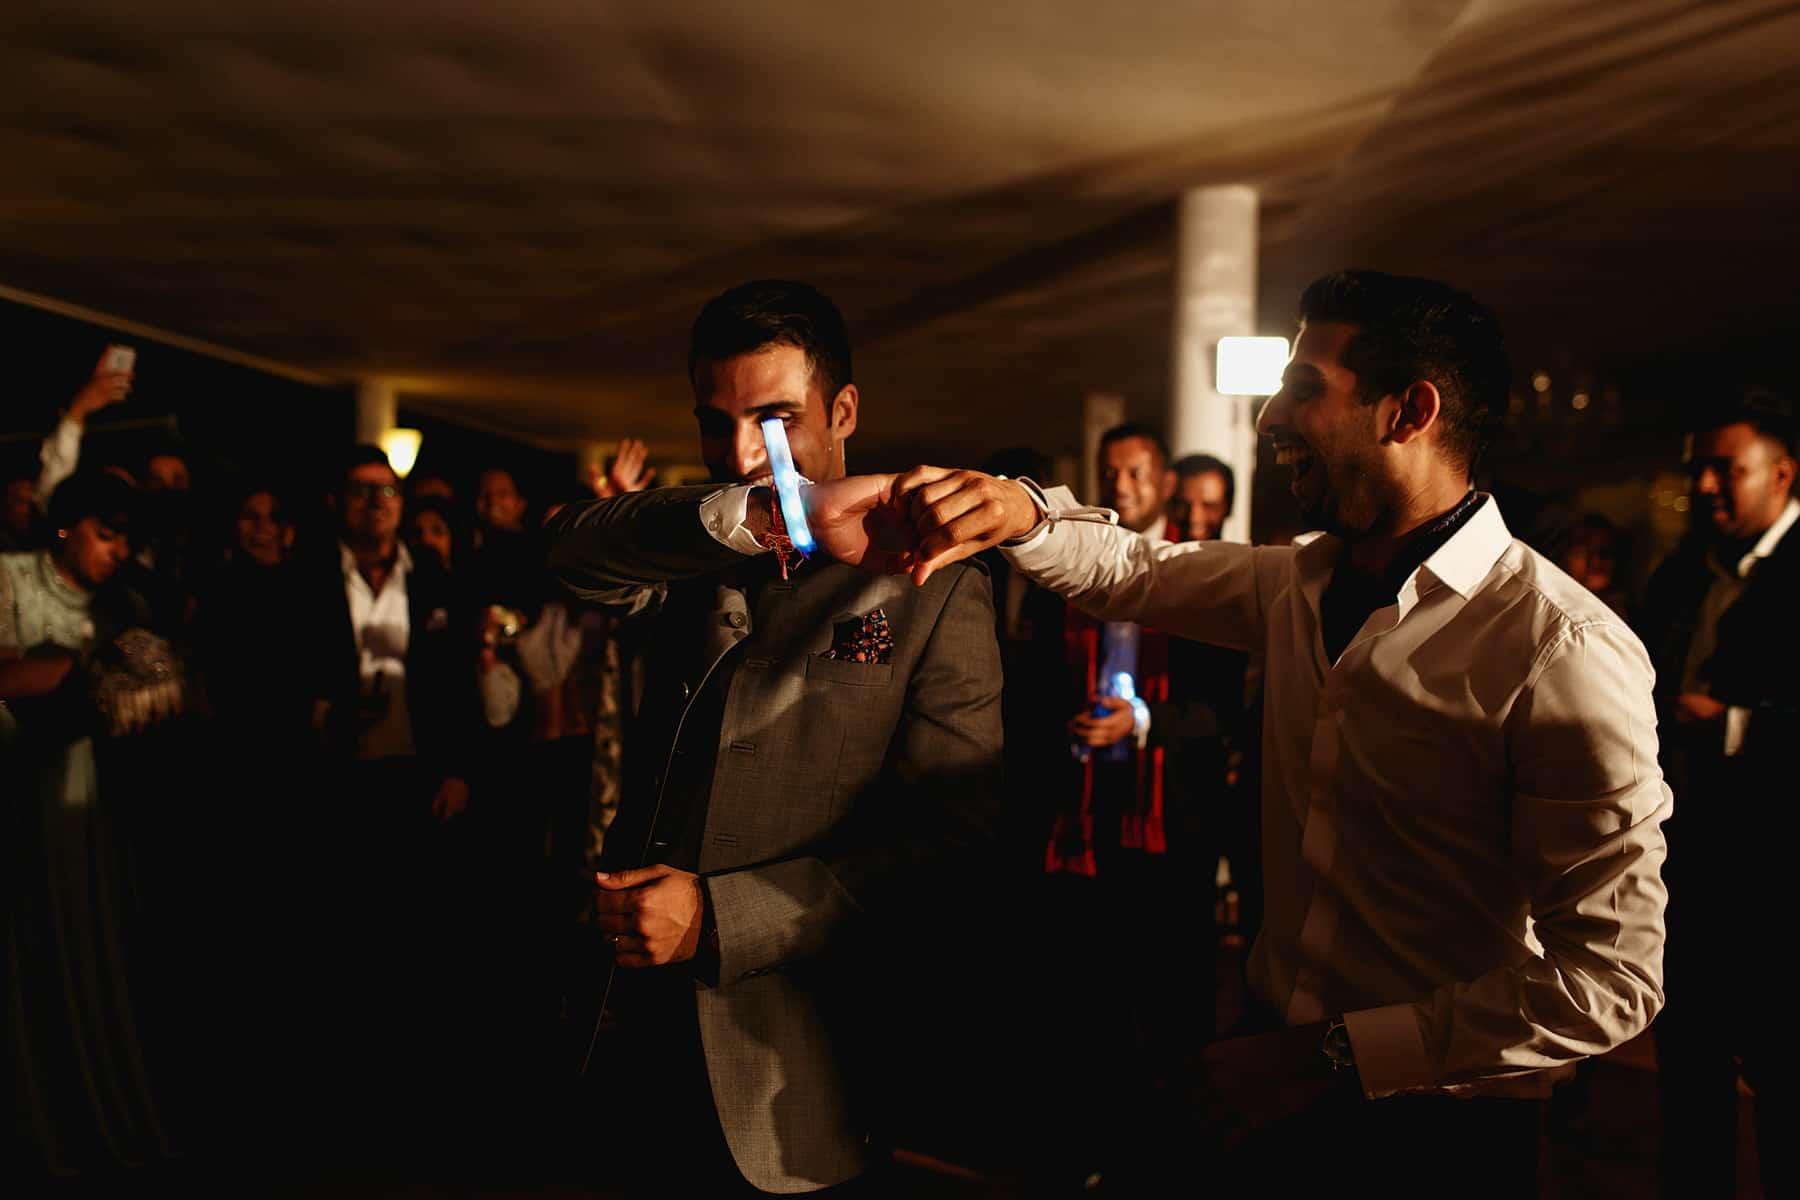 paestum italy wedding photography